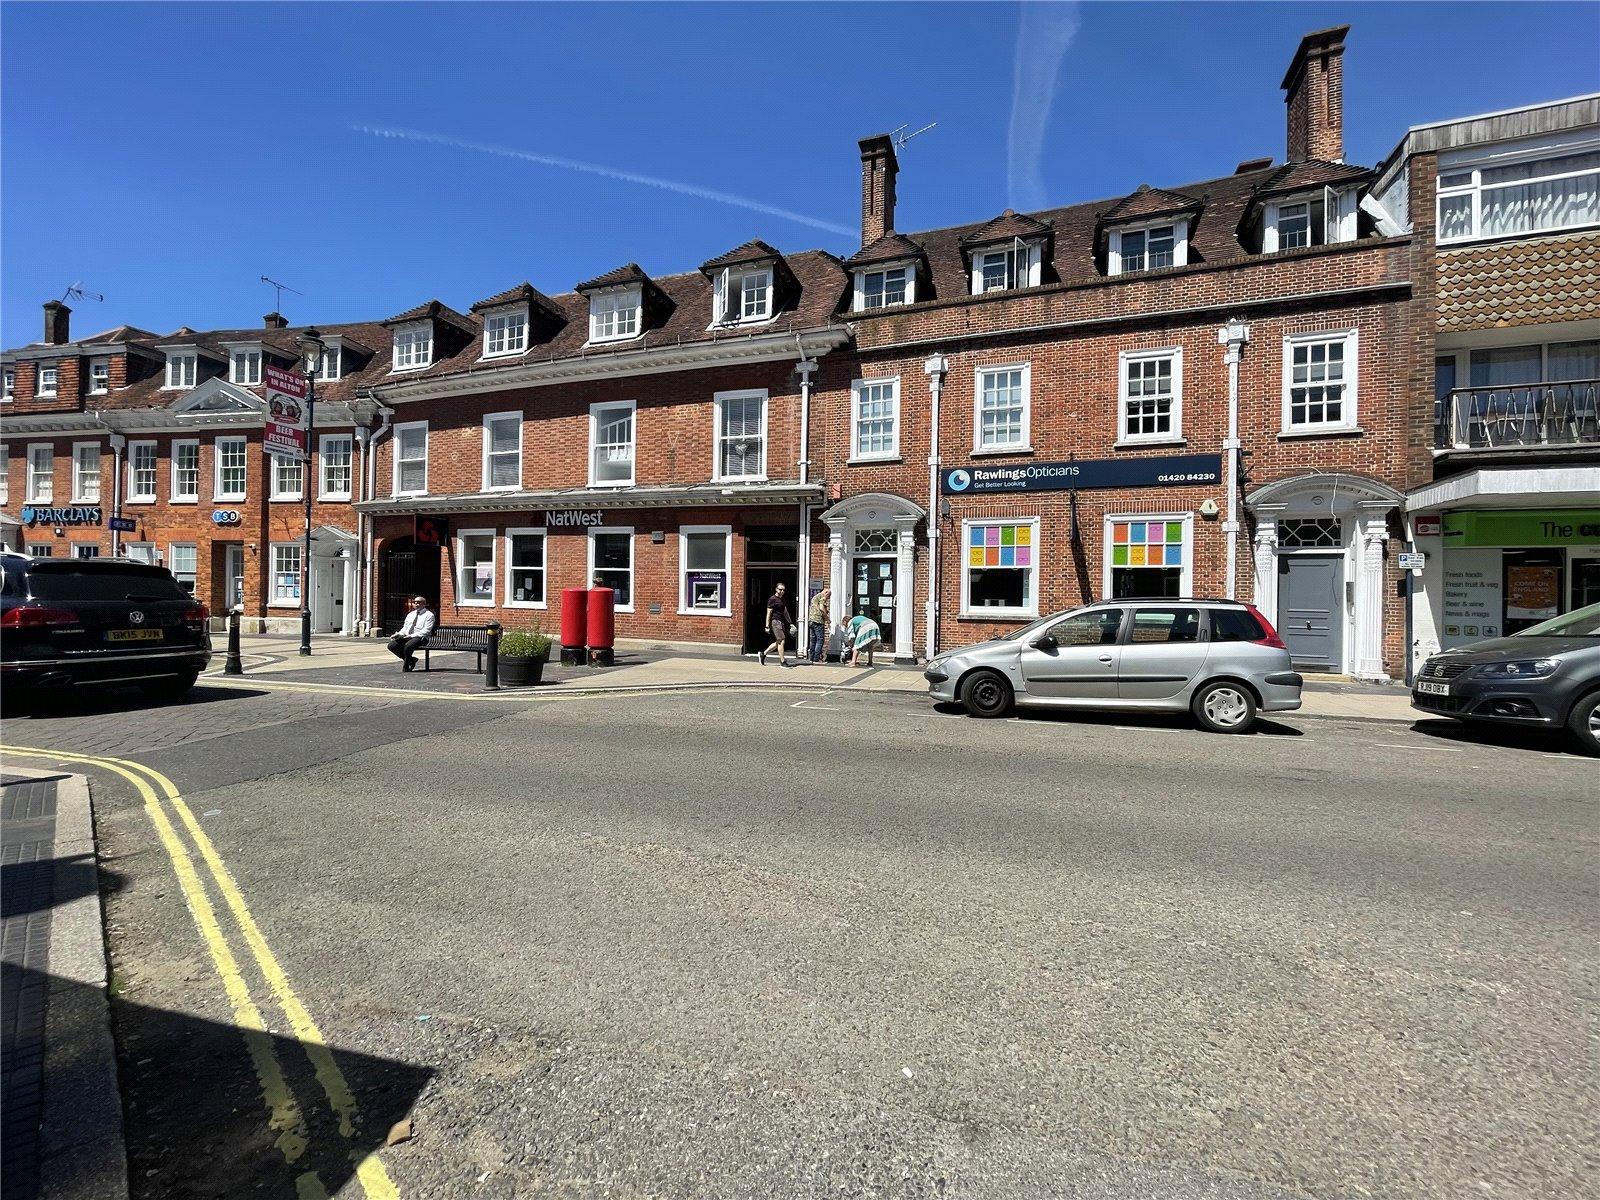 High Street, Alton